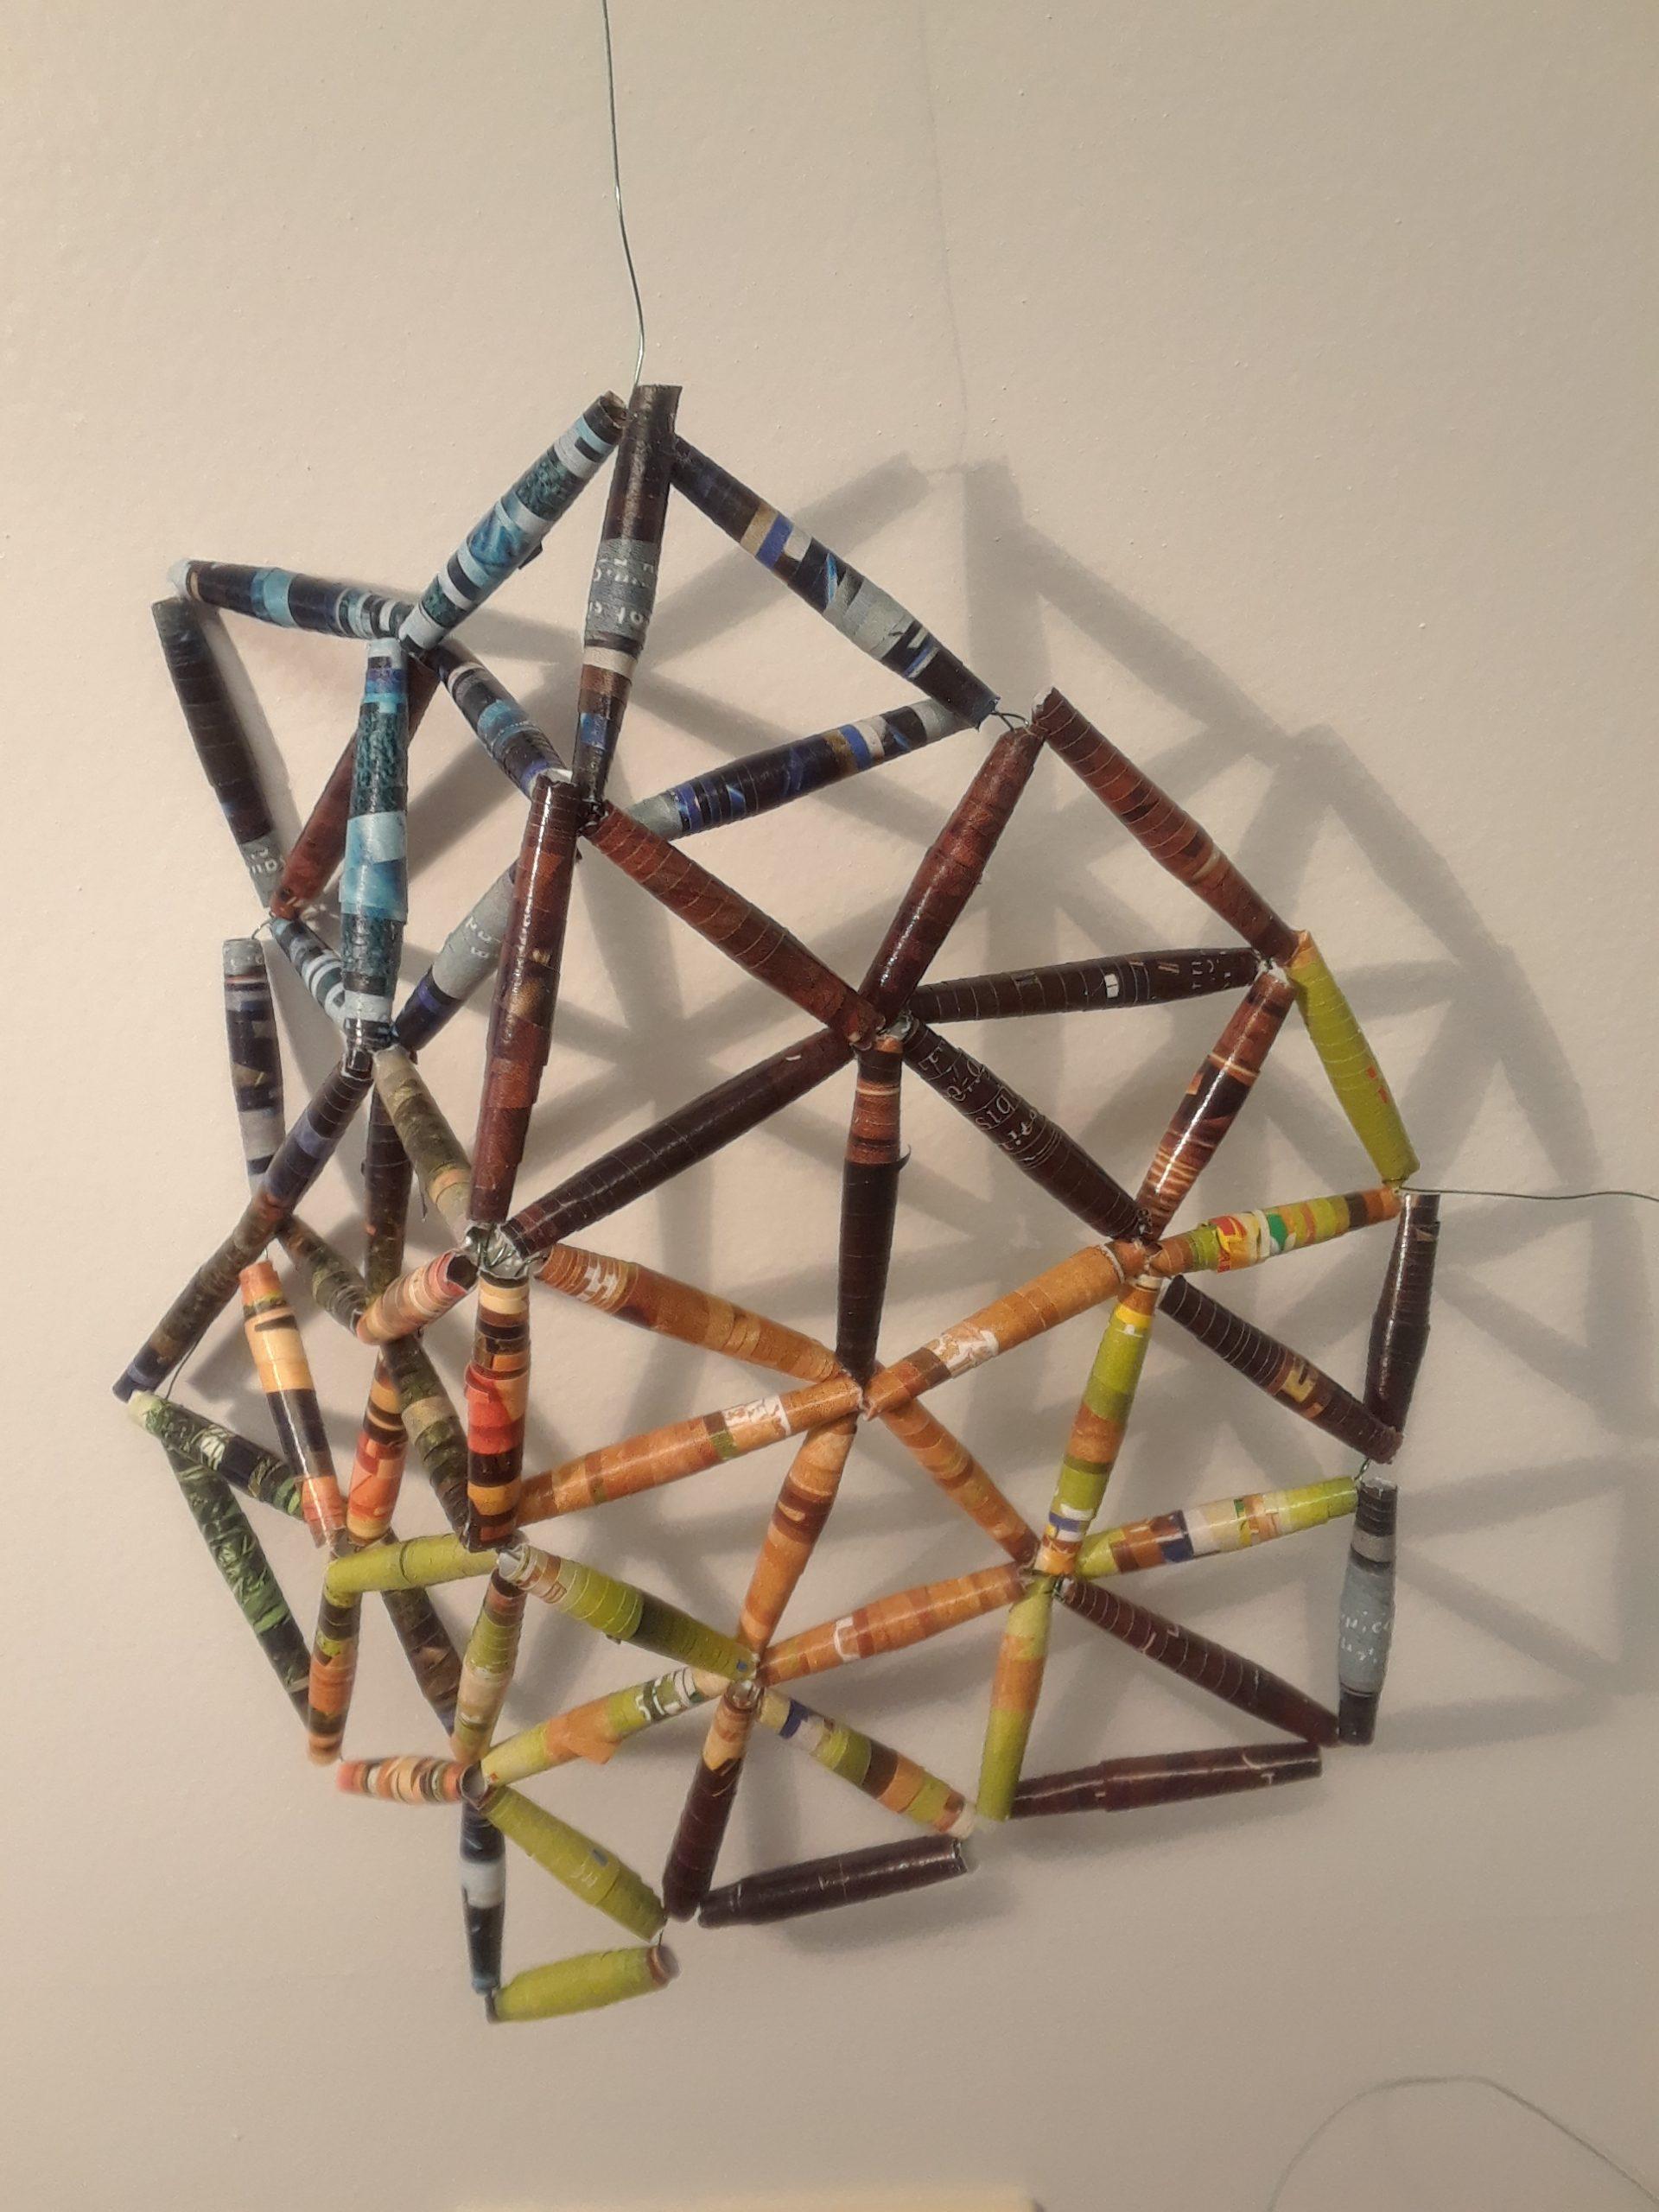 Triangulation-bec302c3